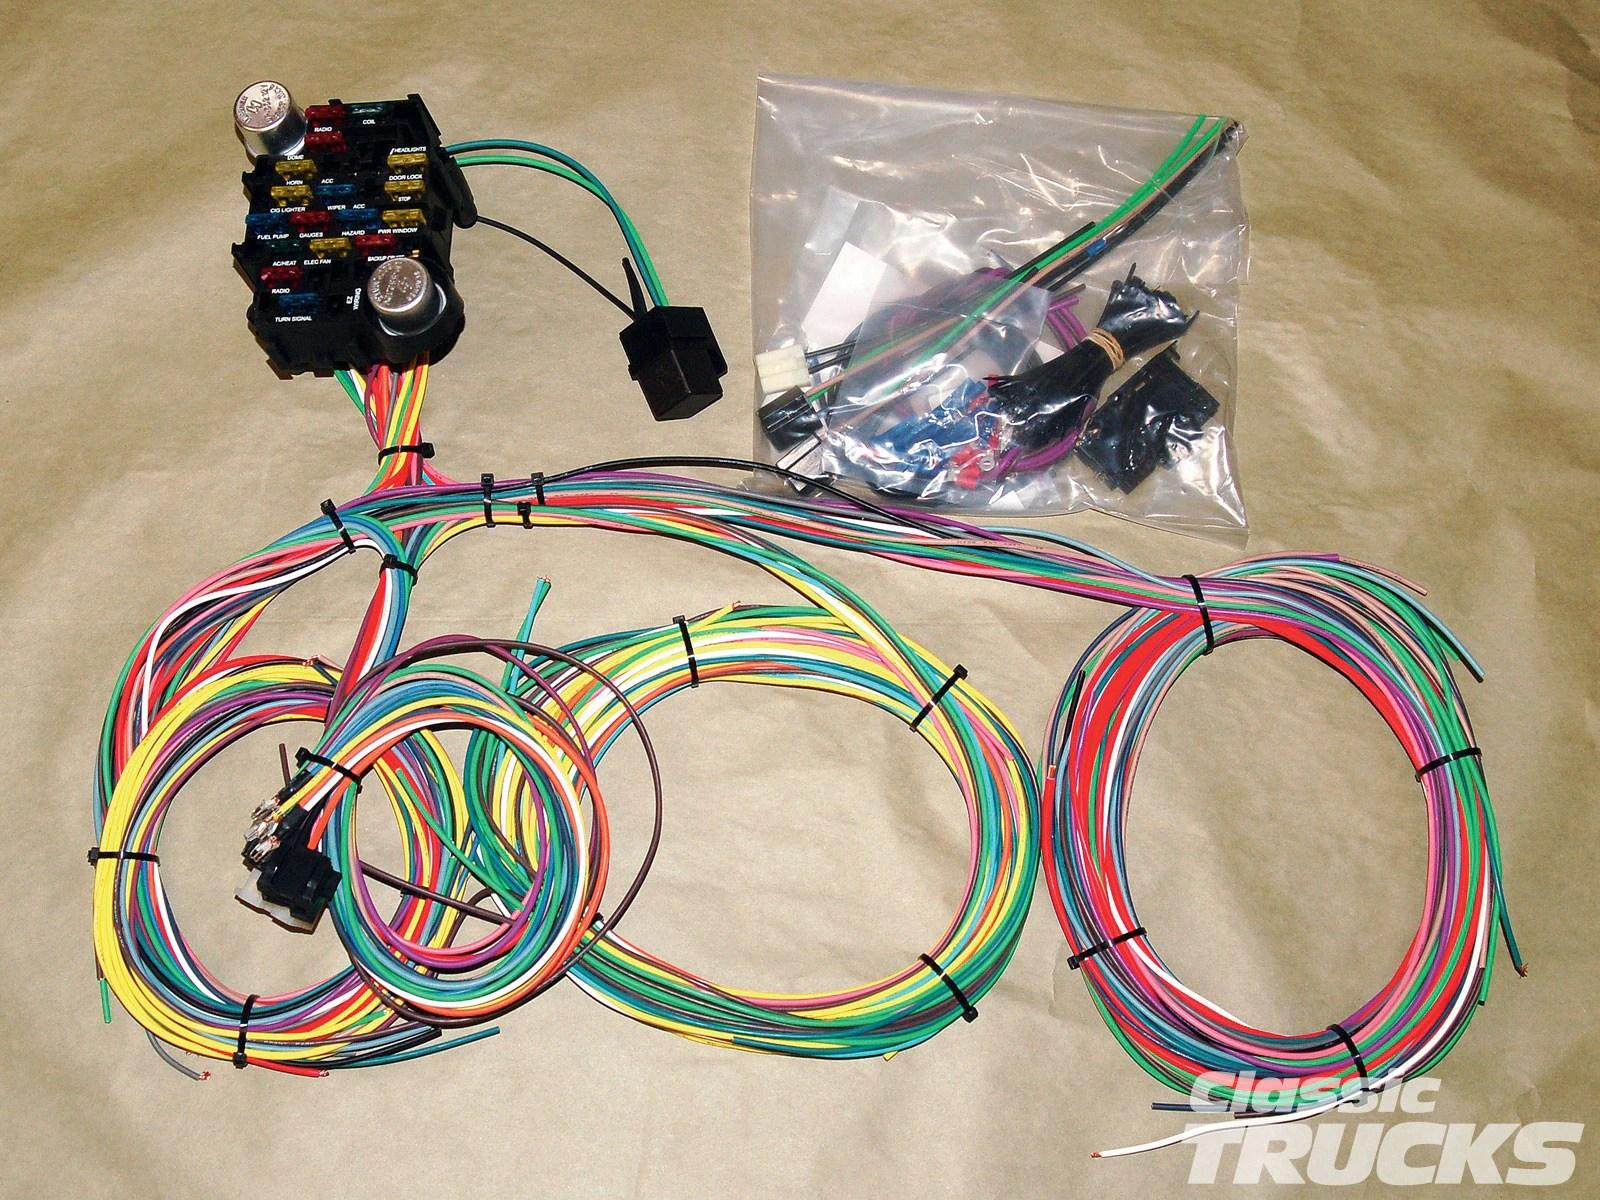 medium resolution of easy wiring harness wiring diagrams lol easy wiring harness kit car